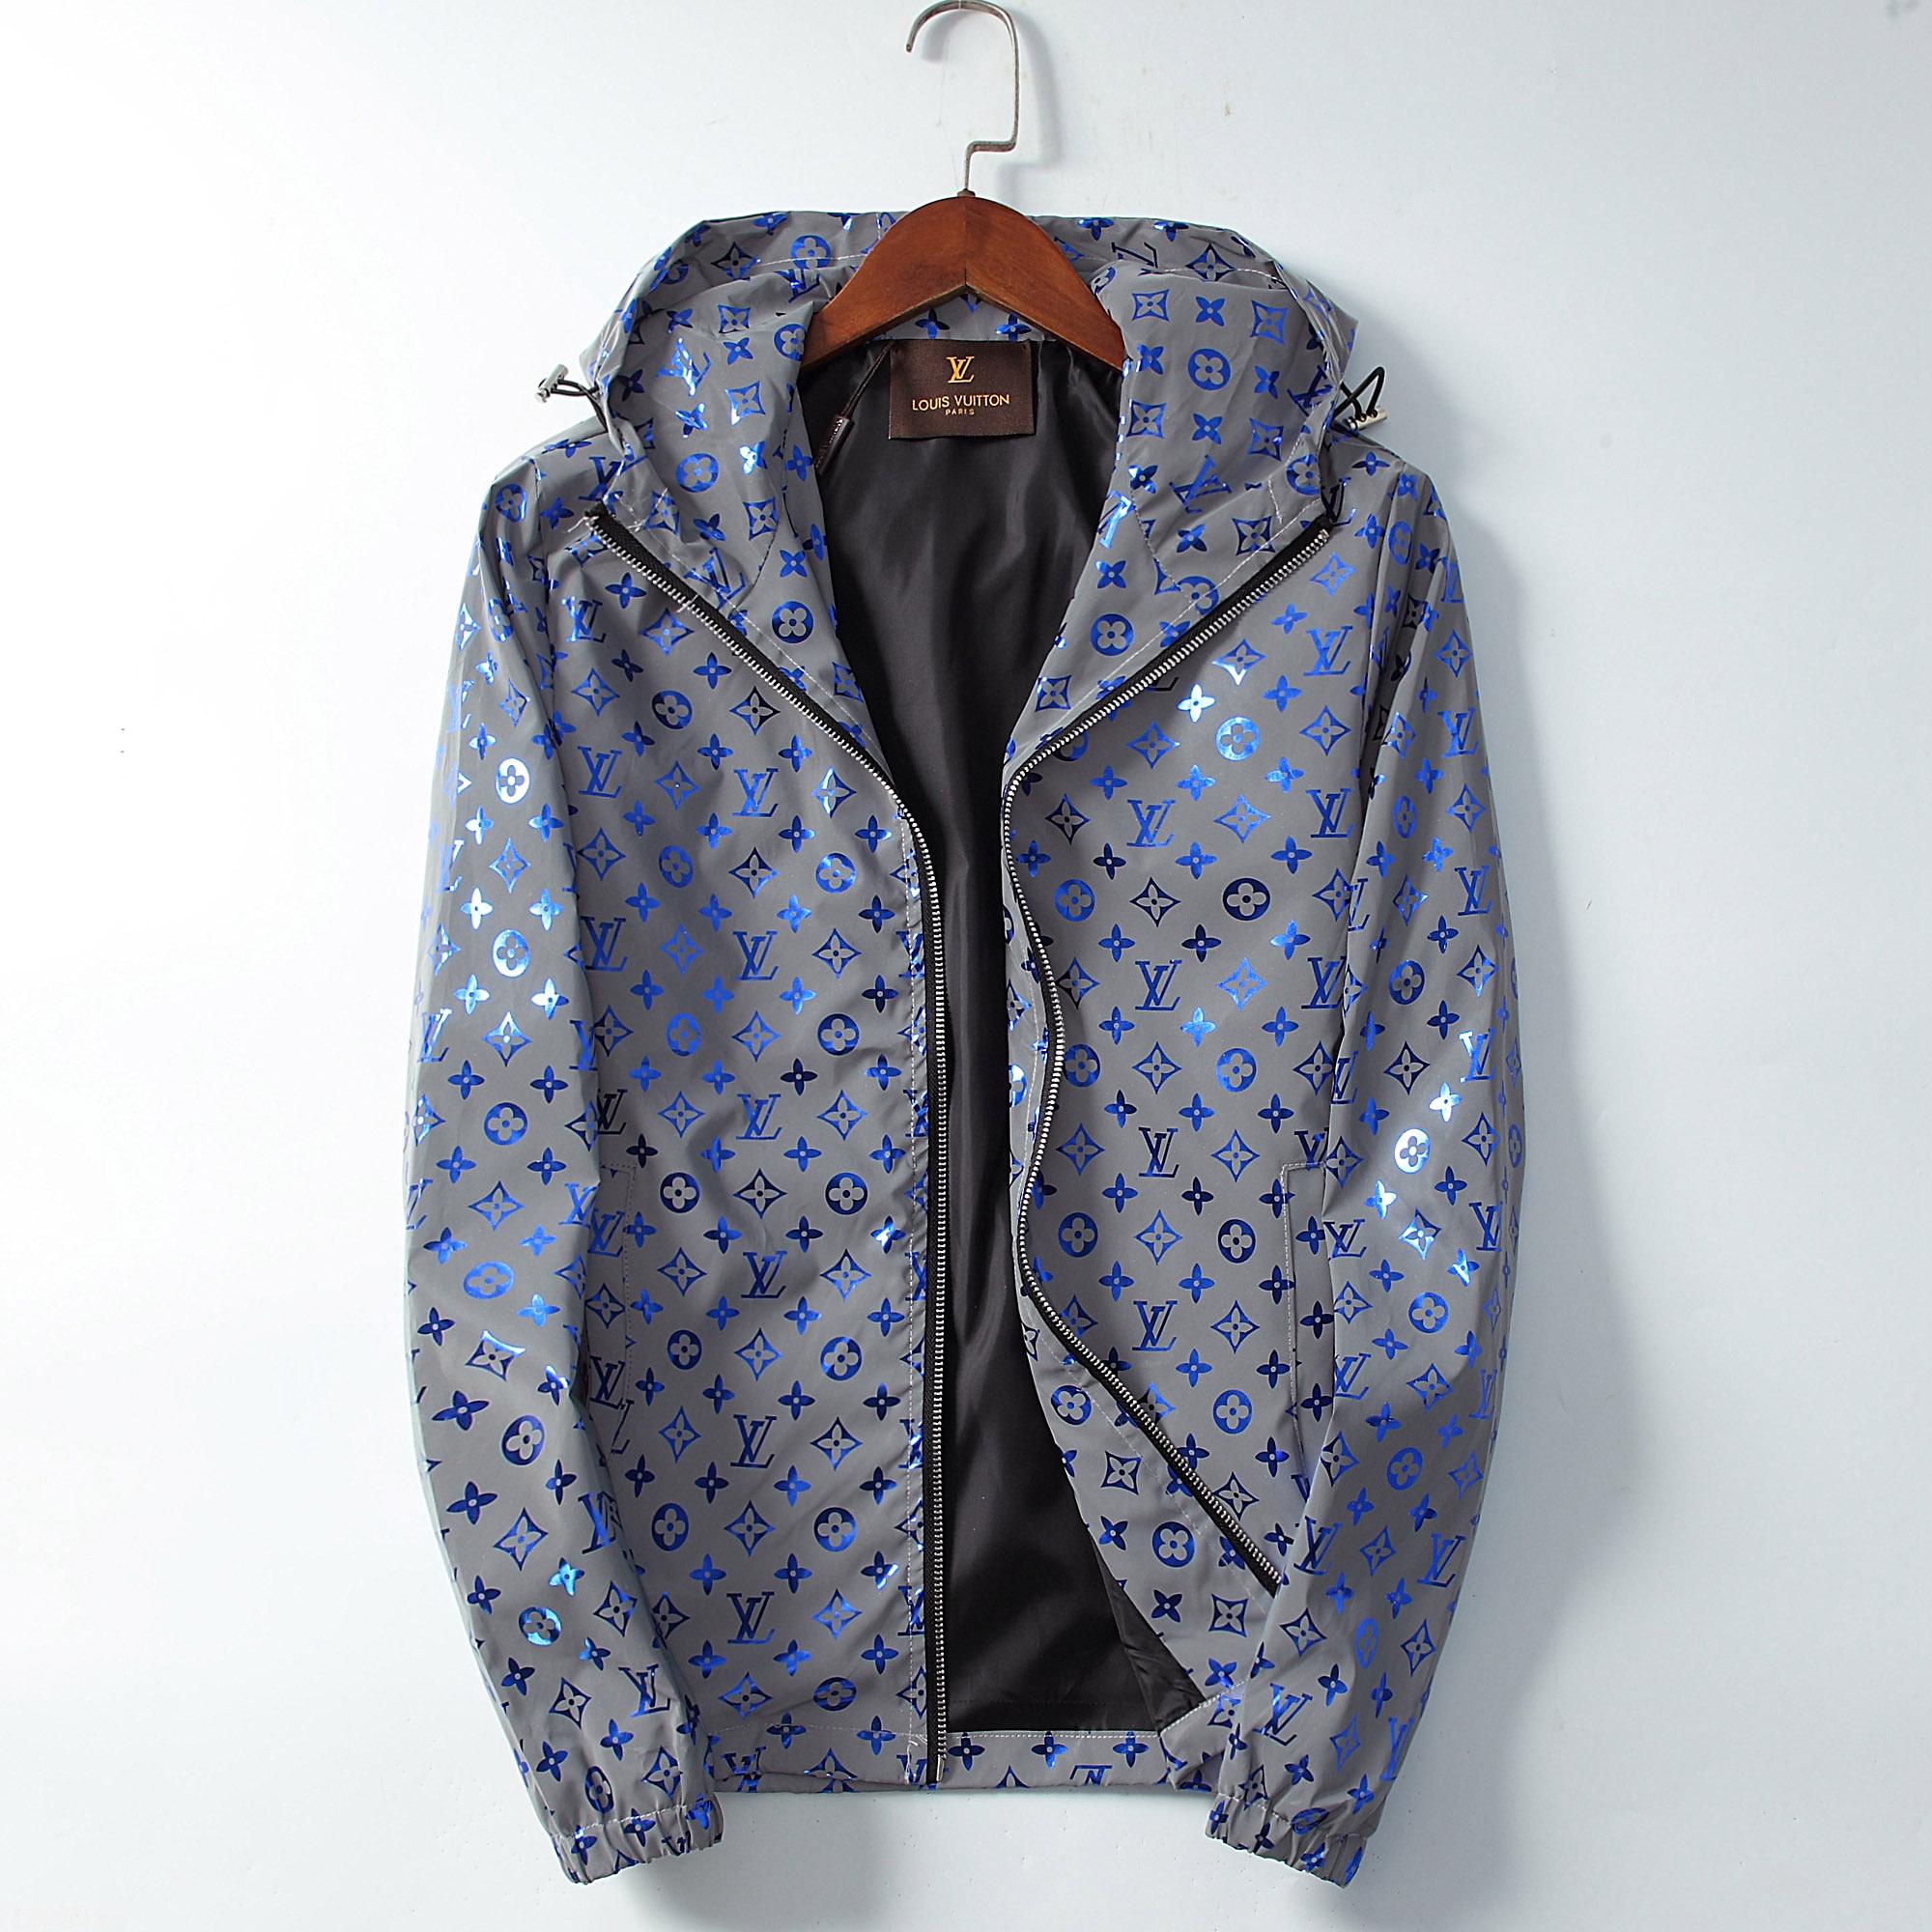 Unisex Off White Washed Denim Shirt Impression Arrow Hip-hop Jeans Jacket M-2XL